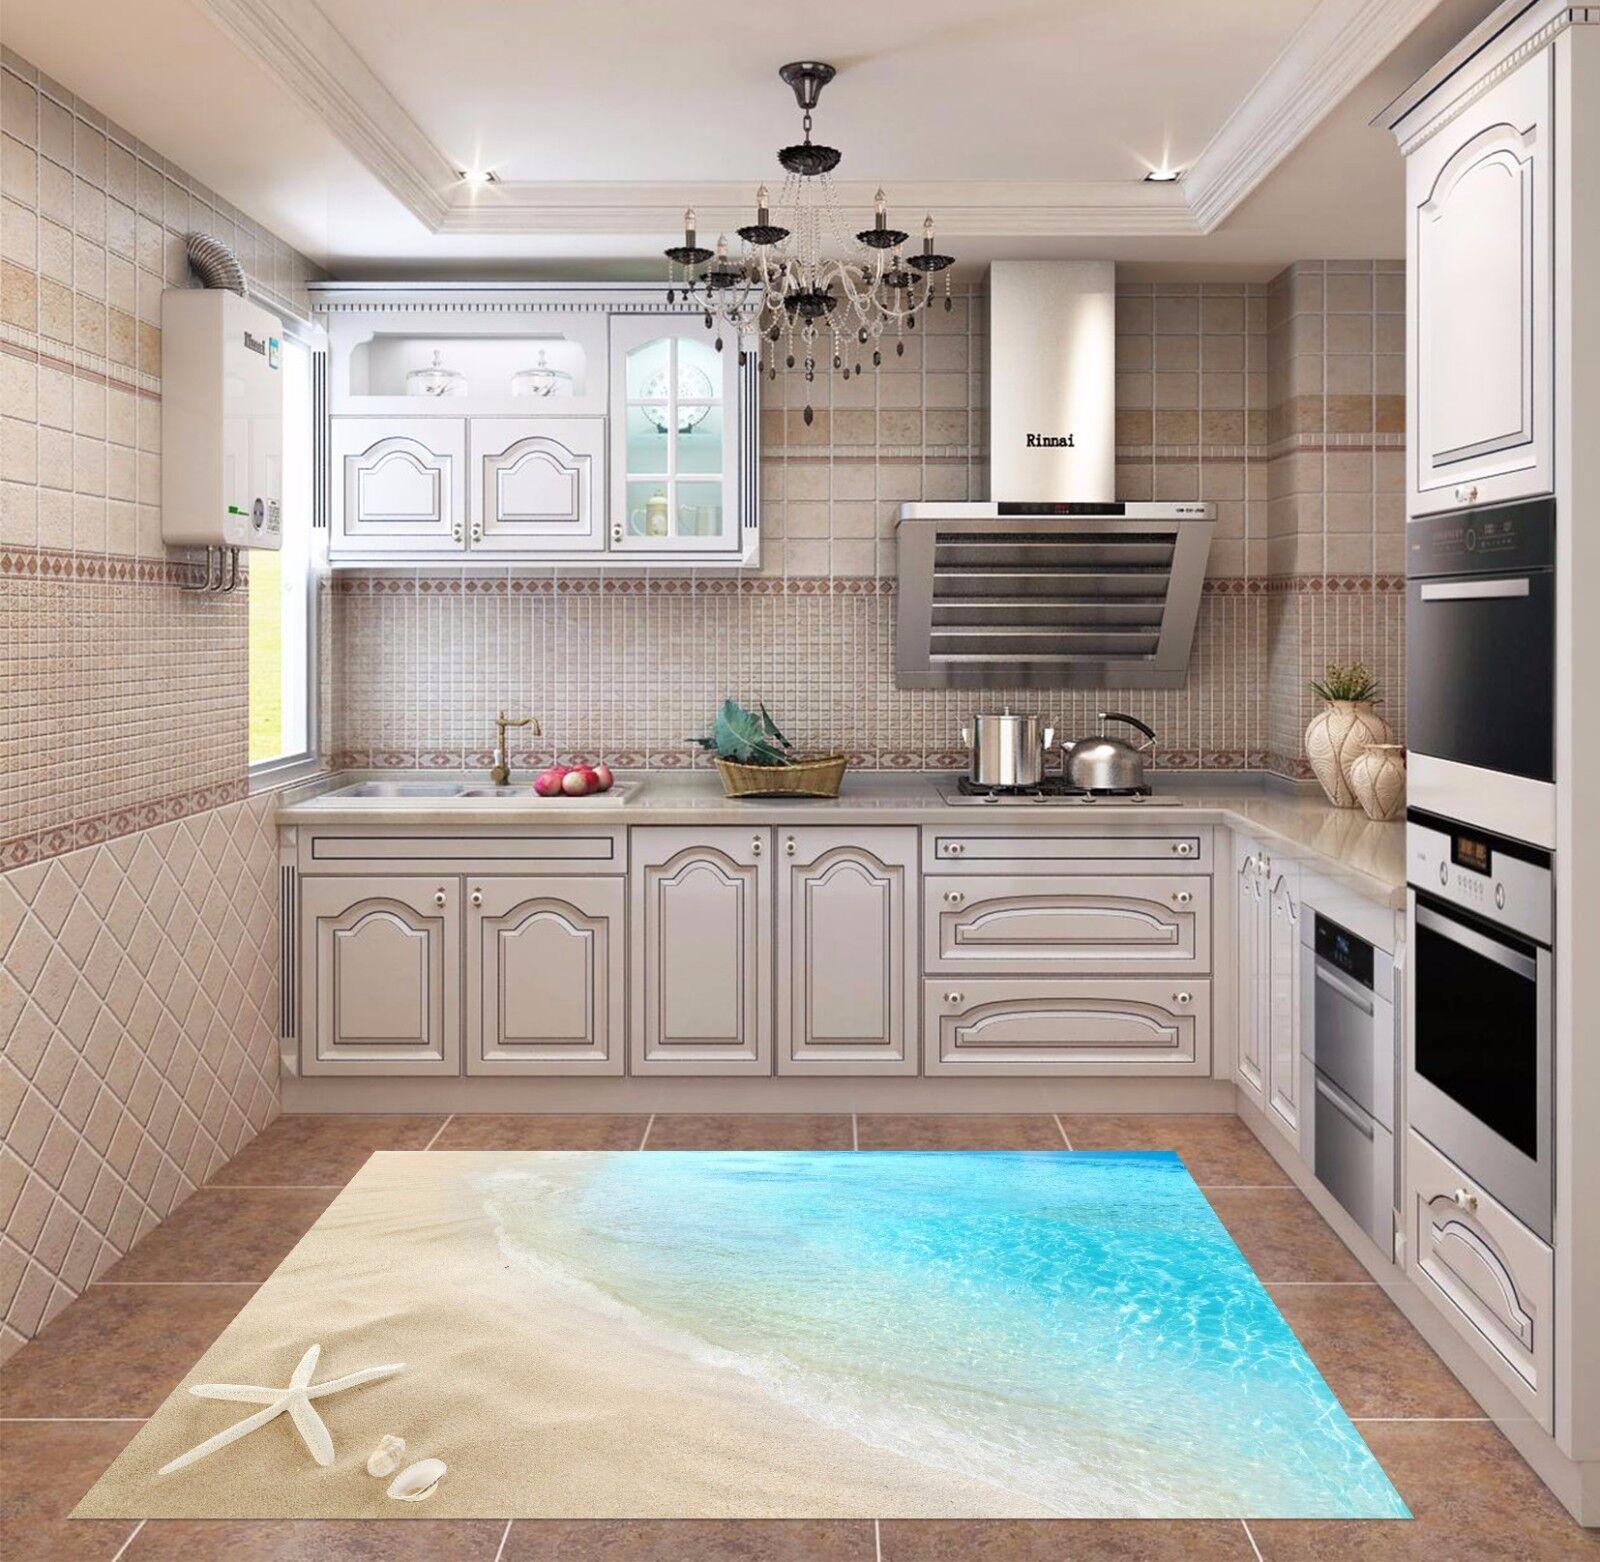 3D Blu Beach 62 Tappetino da cucina Muro pavimento Murales Muro ...